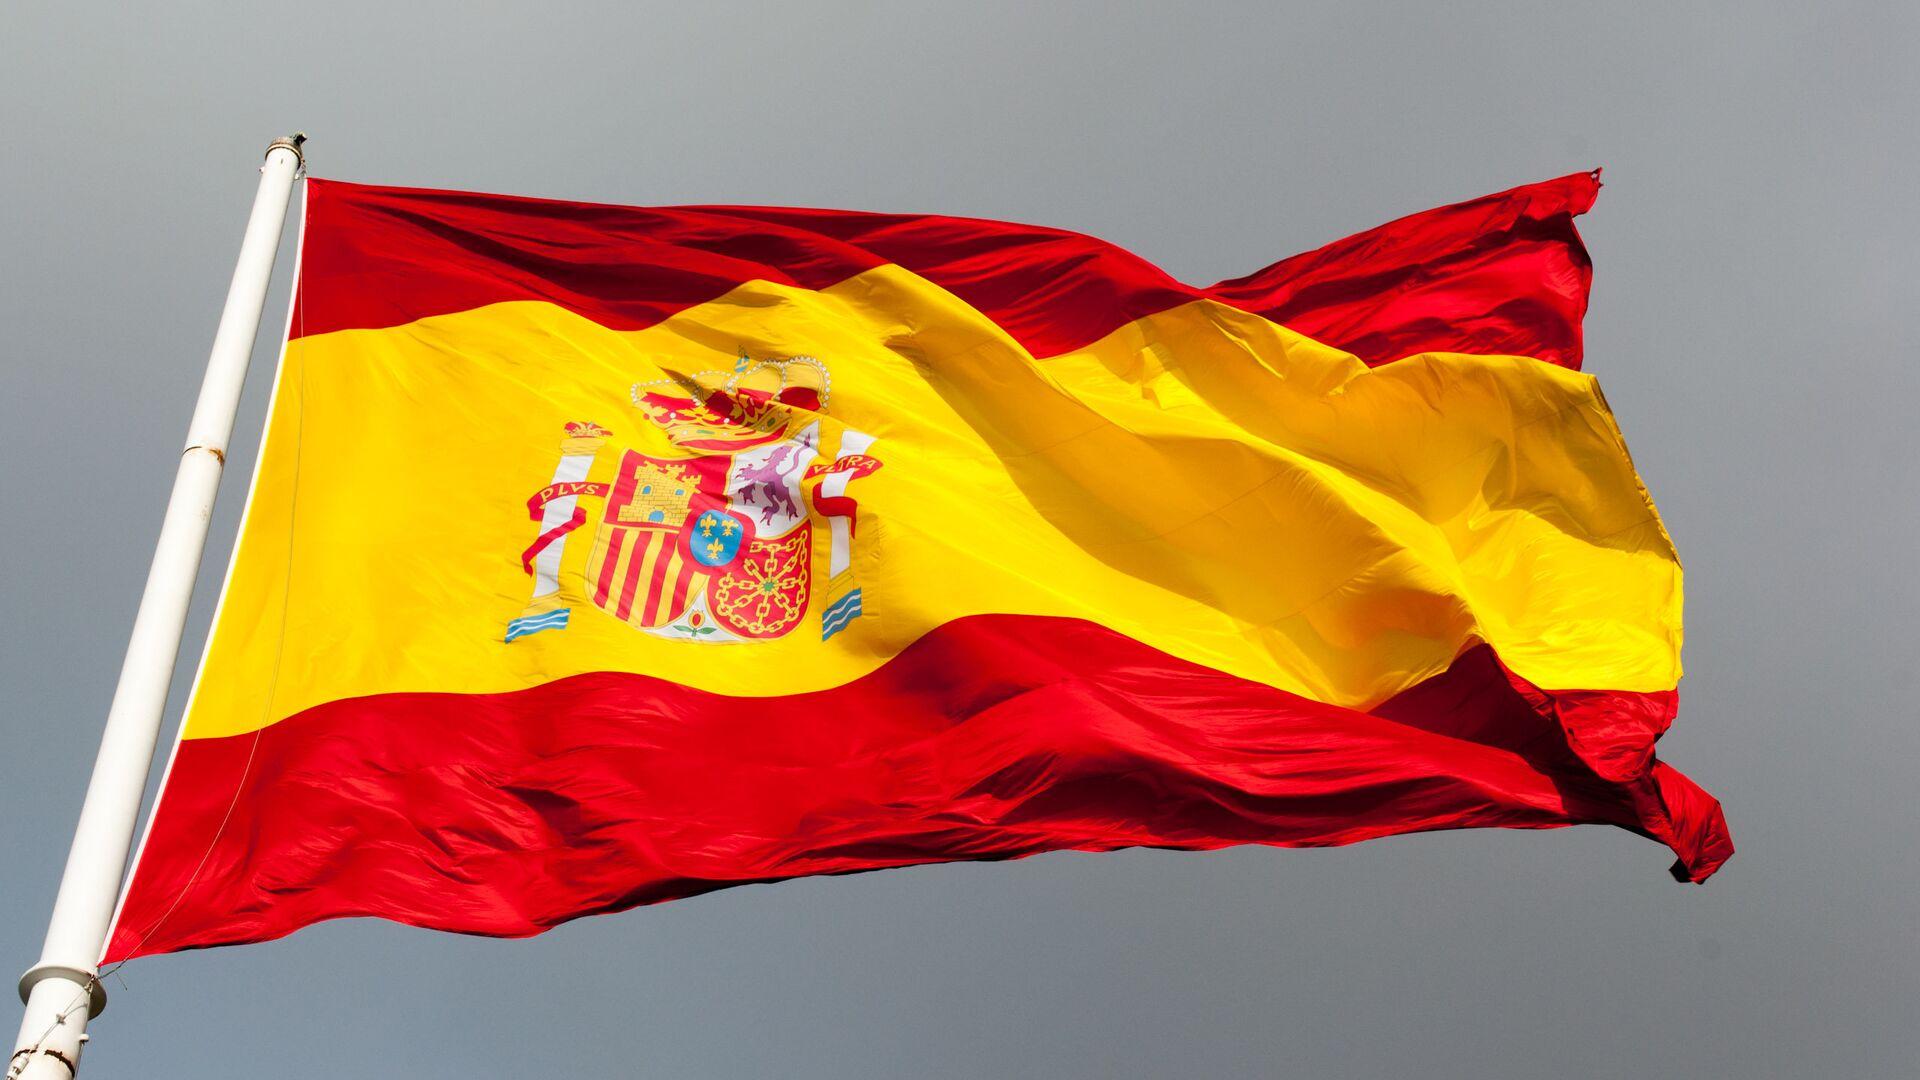 Bandera de España - Sputnik Mundo, 1920, 14.04.2021